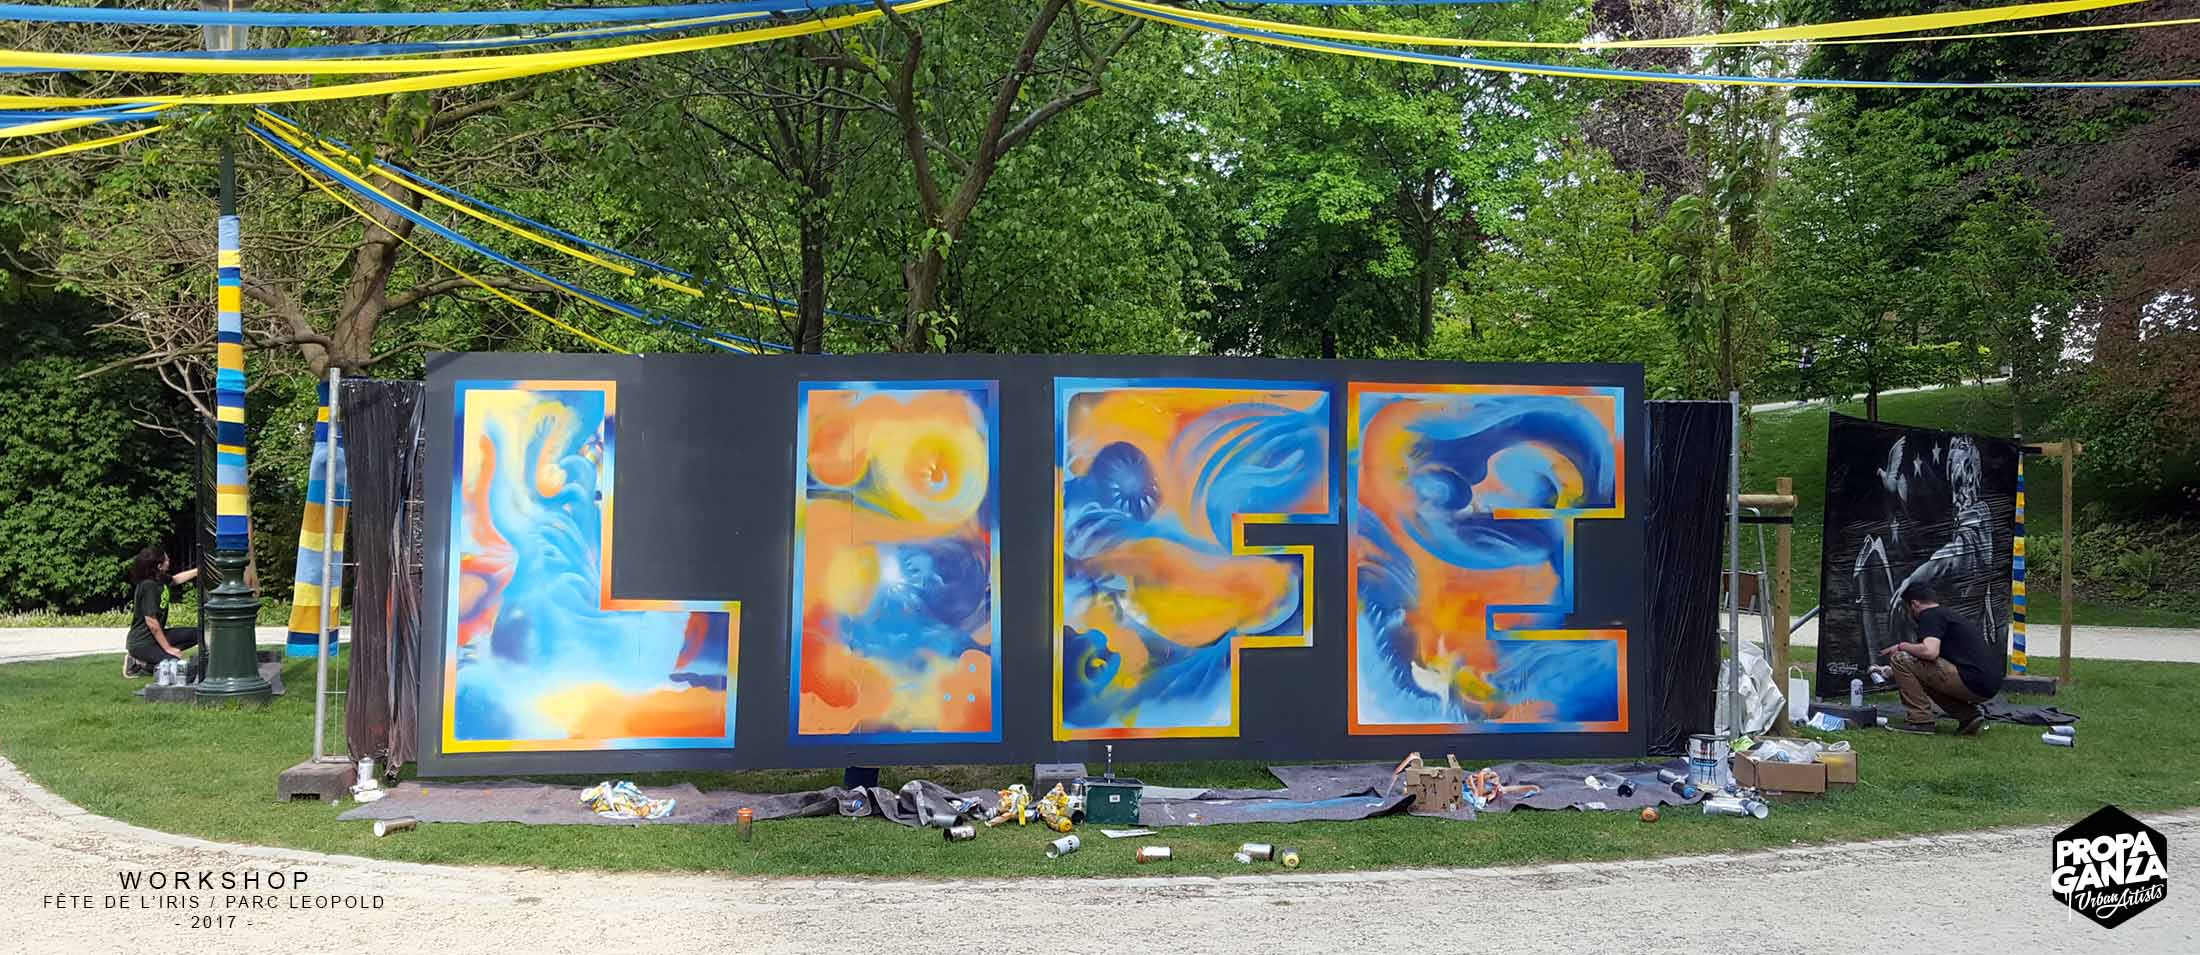 https://www.propaganza.be/wp-content/uploads/2019/04/Propaganza-graffiti-workshop-iris-leopold-parc-bruxelles-brussels-street-art-event-fresque-participative-2017.jpg